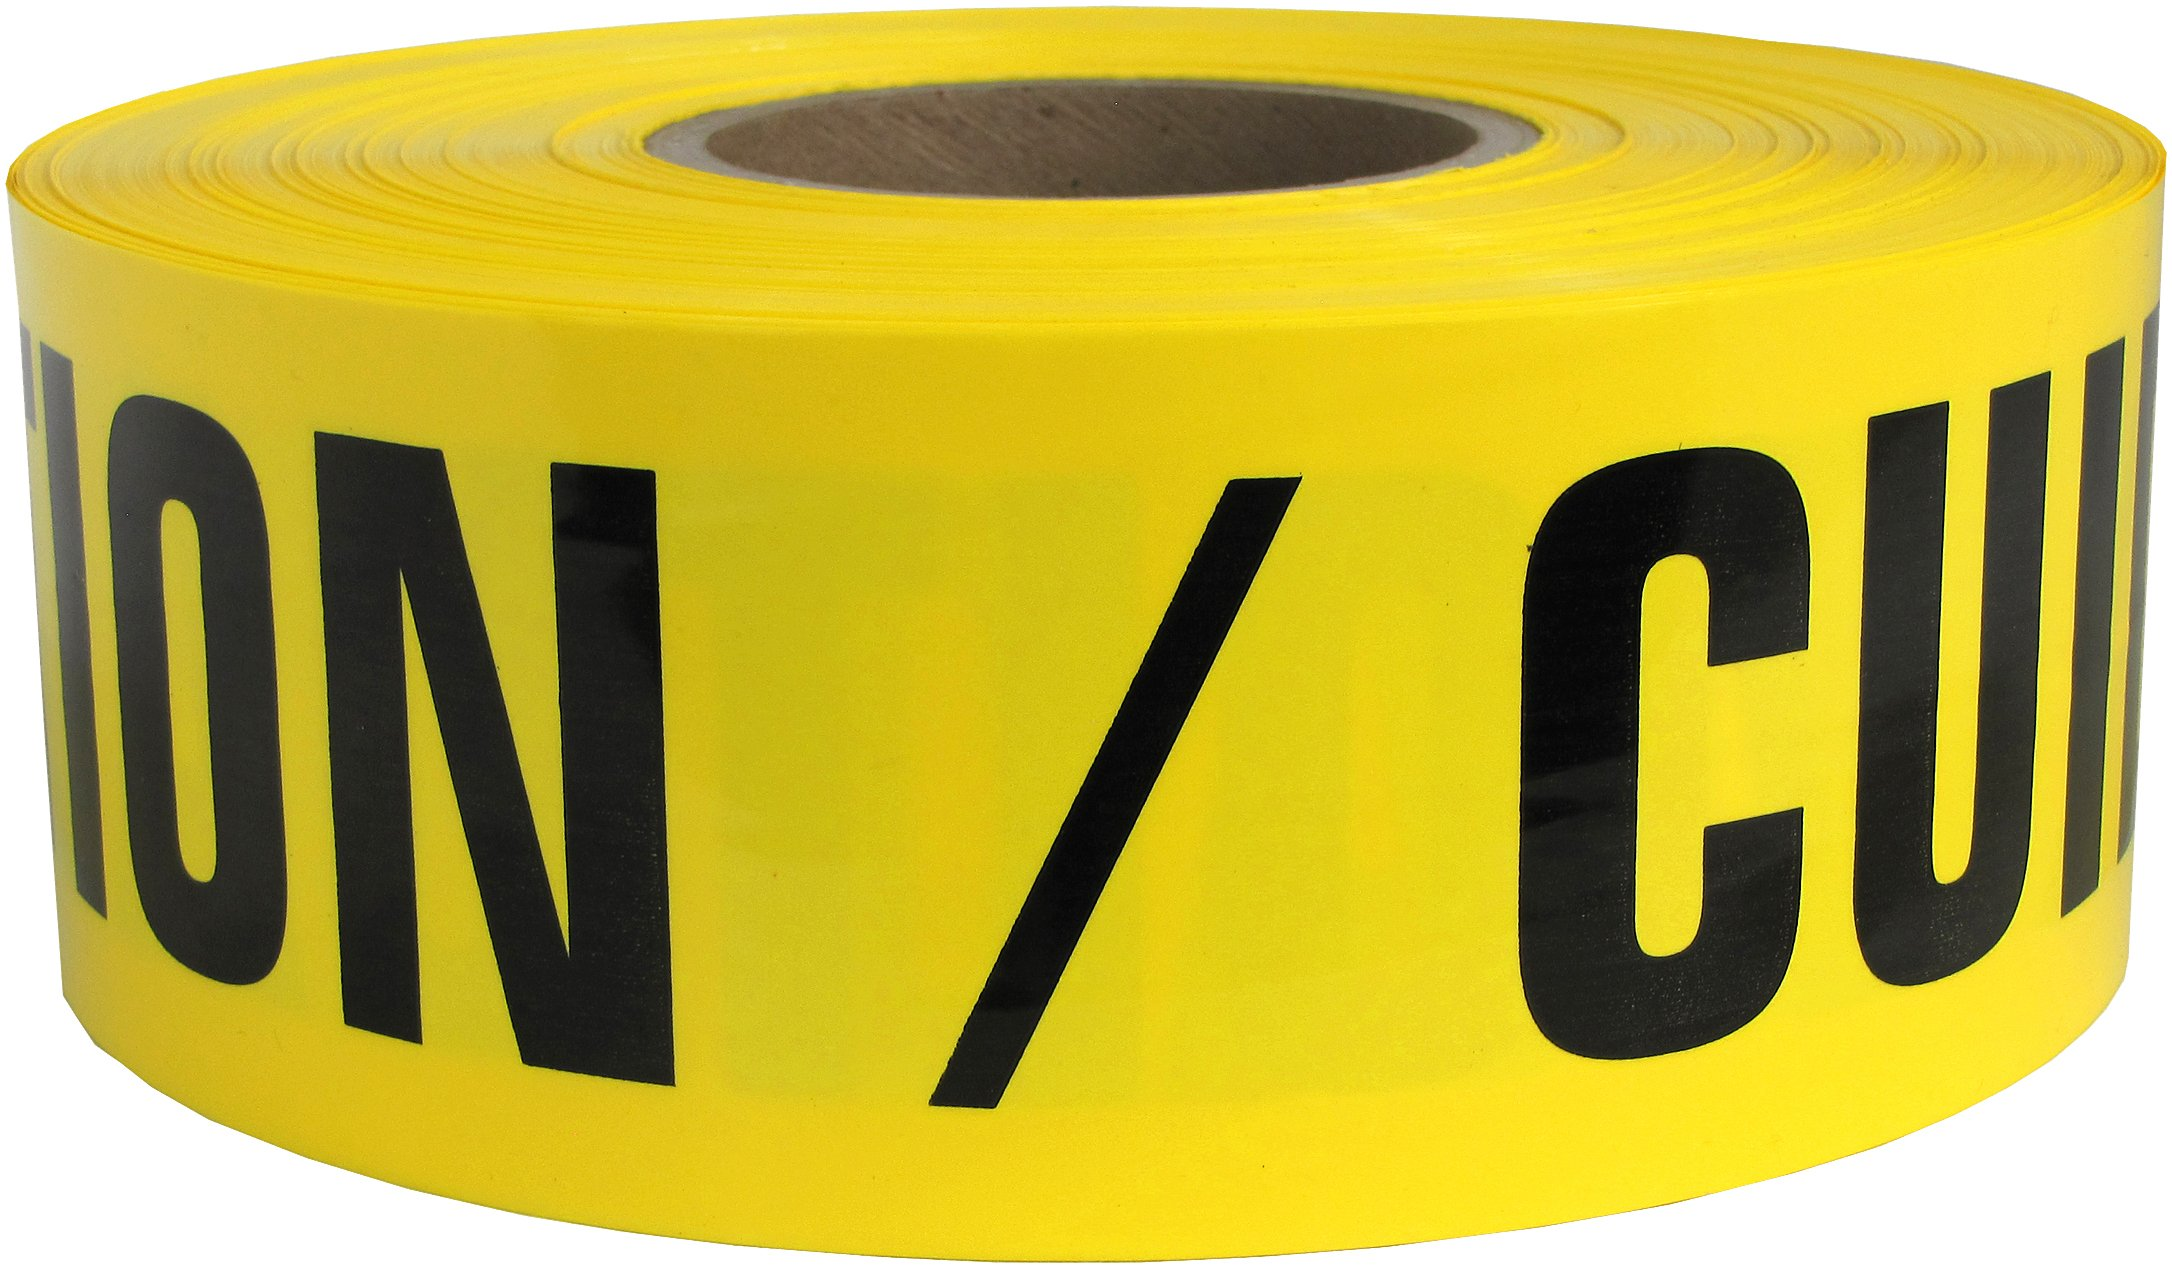 Presco B3103Y13-658 1000' Length x 3'' Width x 3 mil Thick, Polyethylene, Yellow with Black Ink Barricade Tape, Legend ''Caution Cuidado'' (Pack of 8)